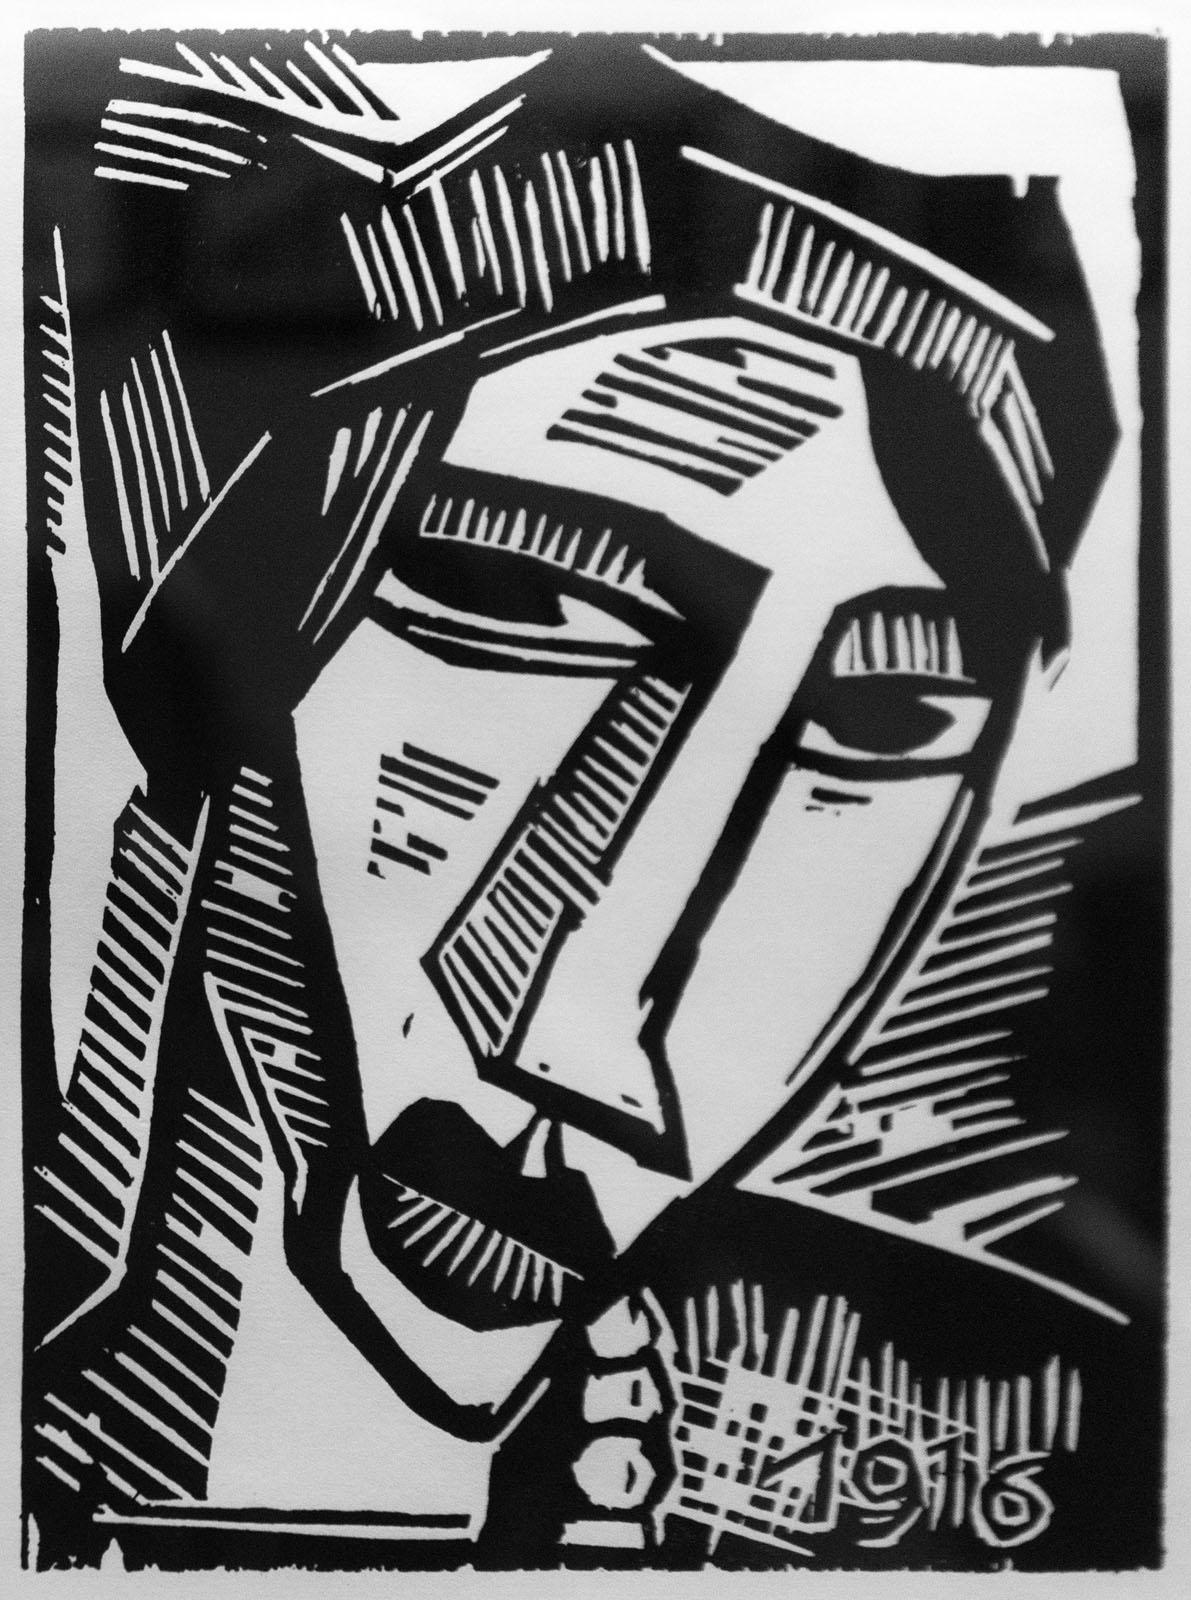 Фото №76507. Женская голова. 1916. Карл Шмидт-Ротлуф (1884-1976)